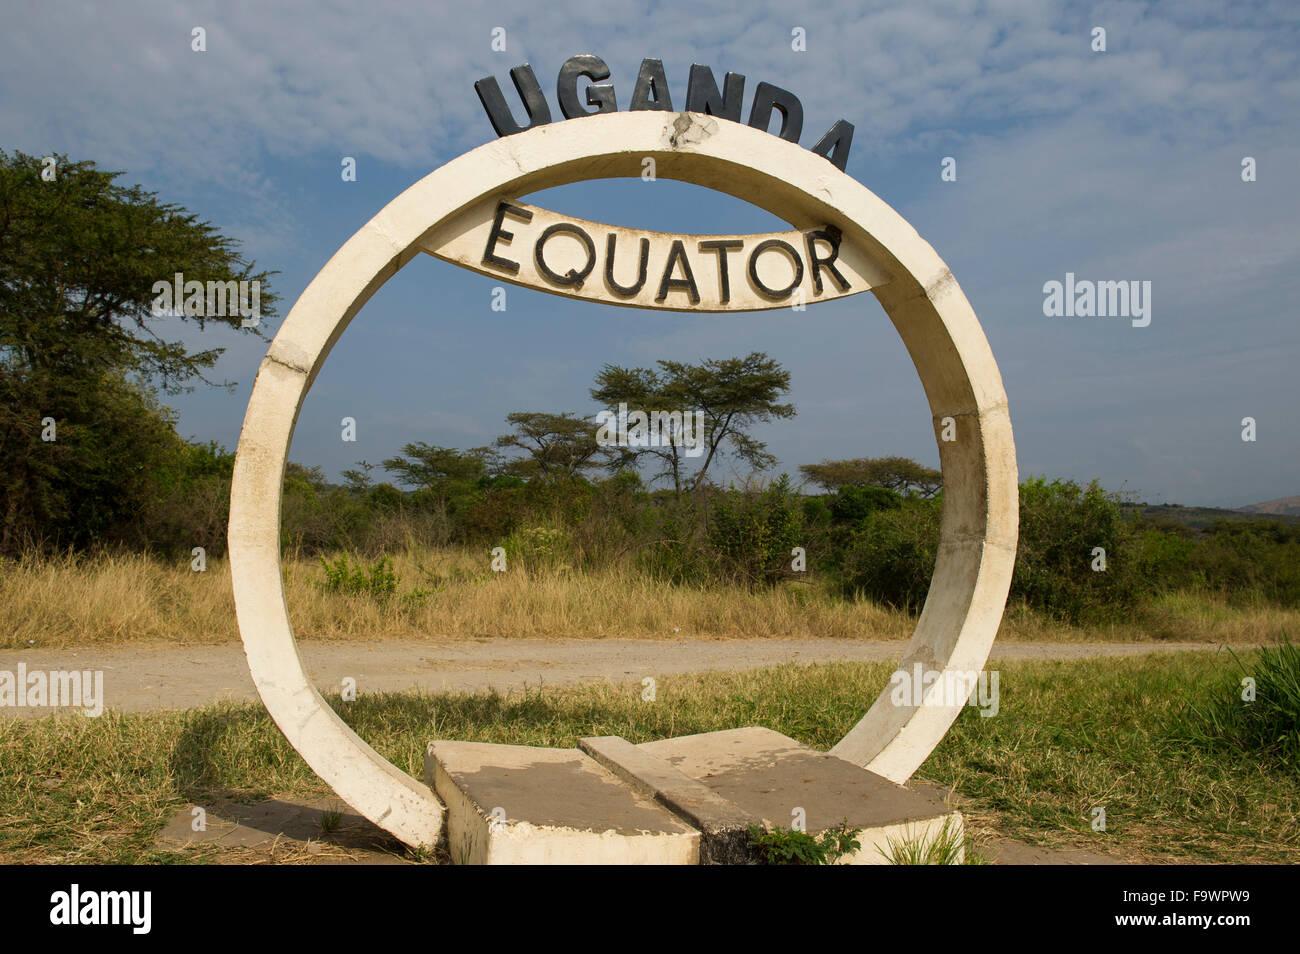 Ecuador, Uganda Imagen De Stock